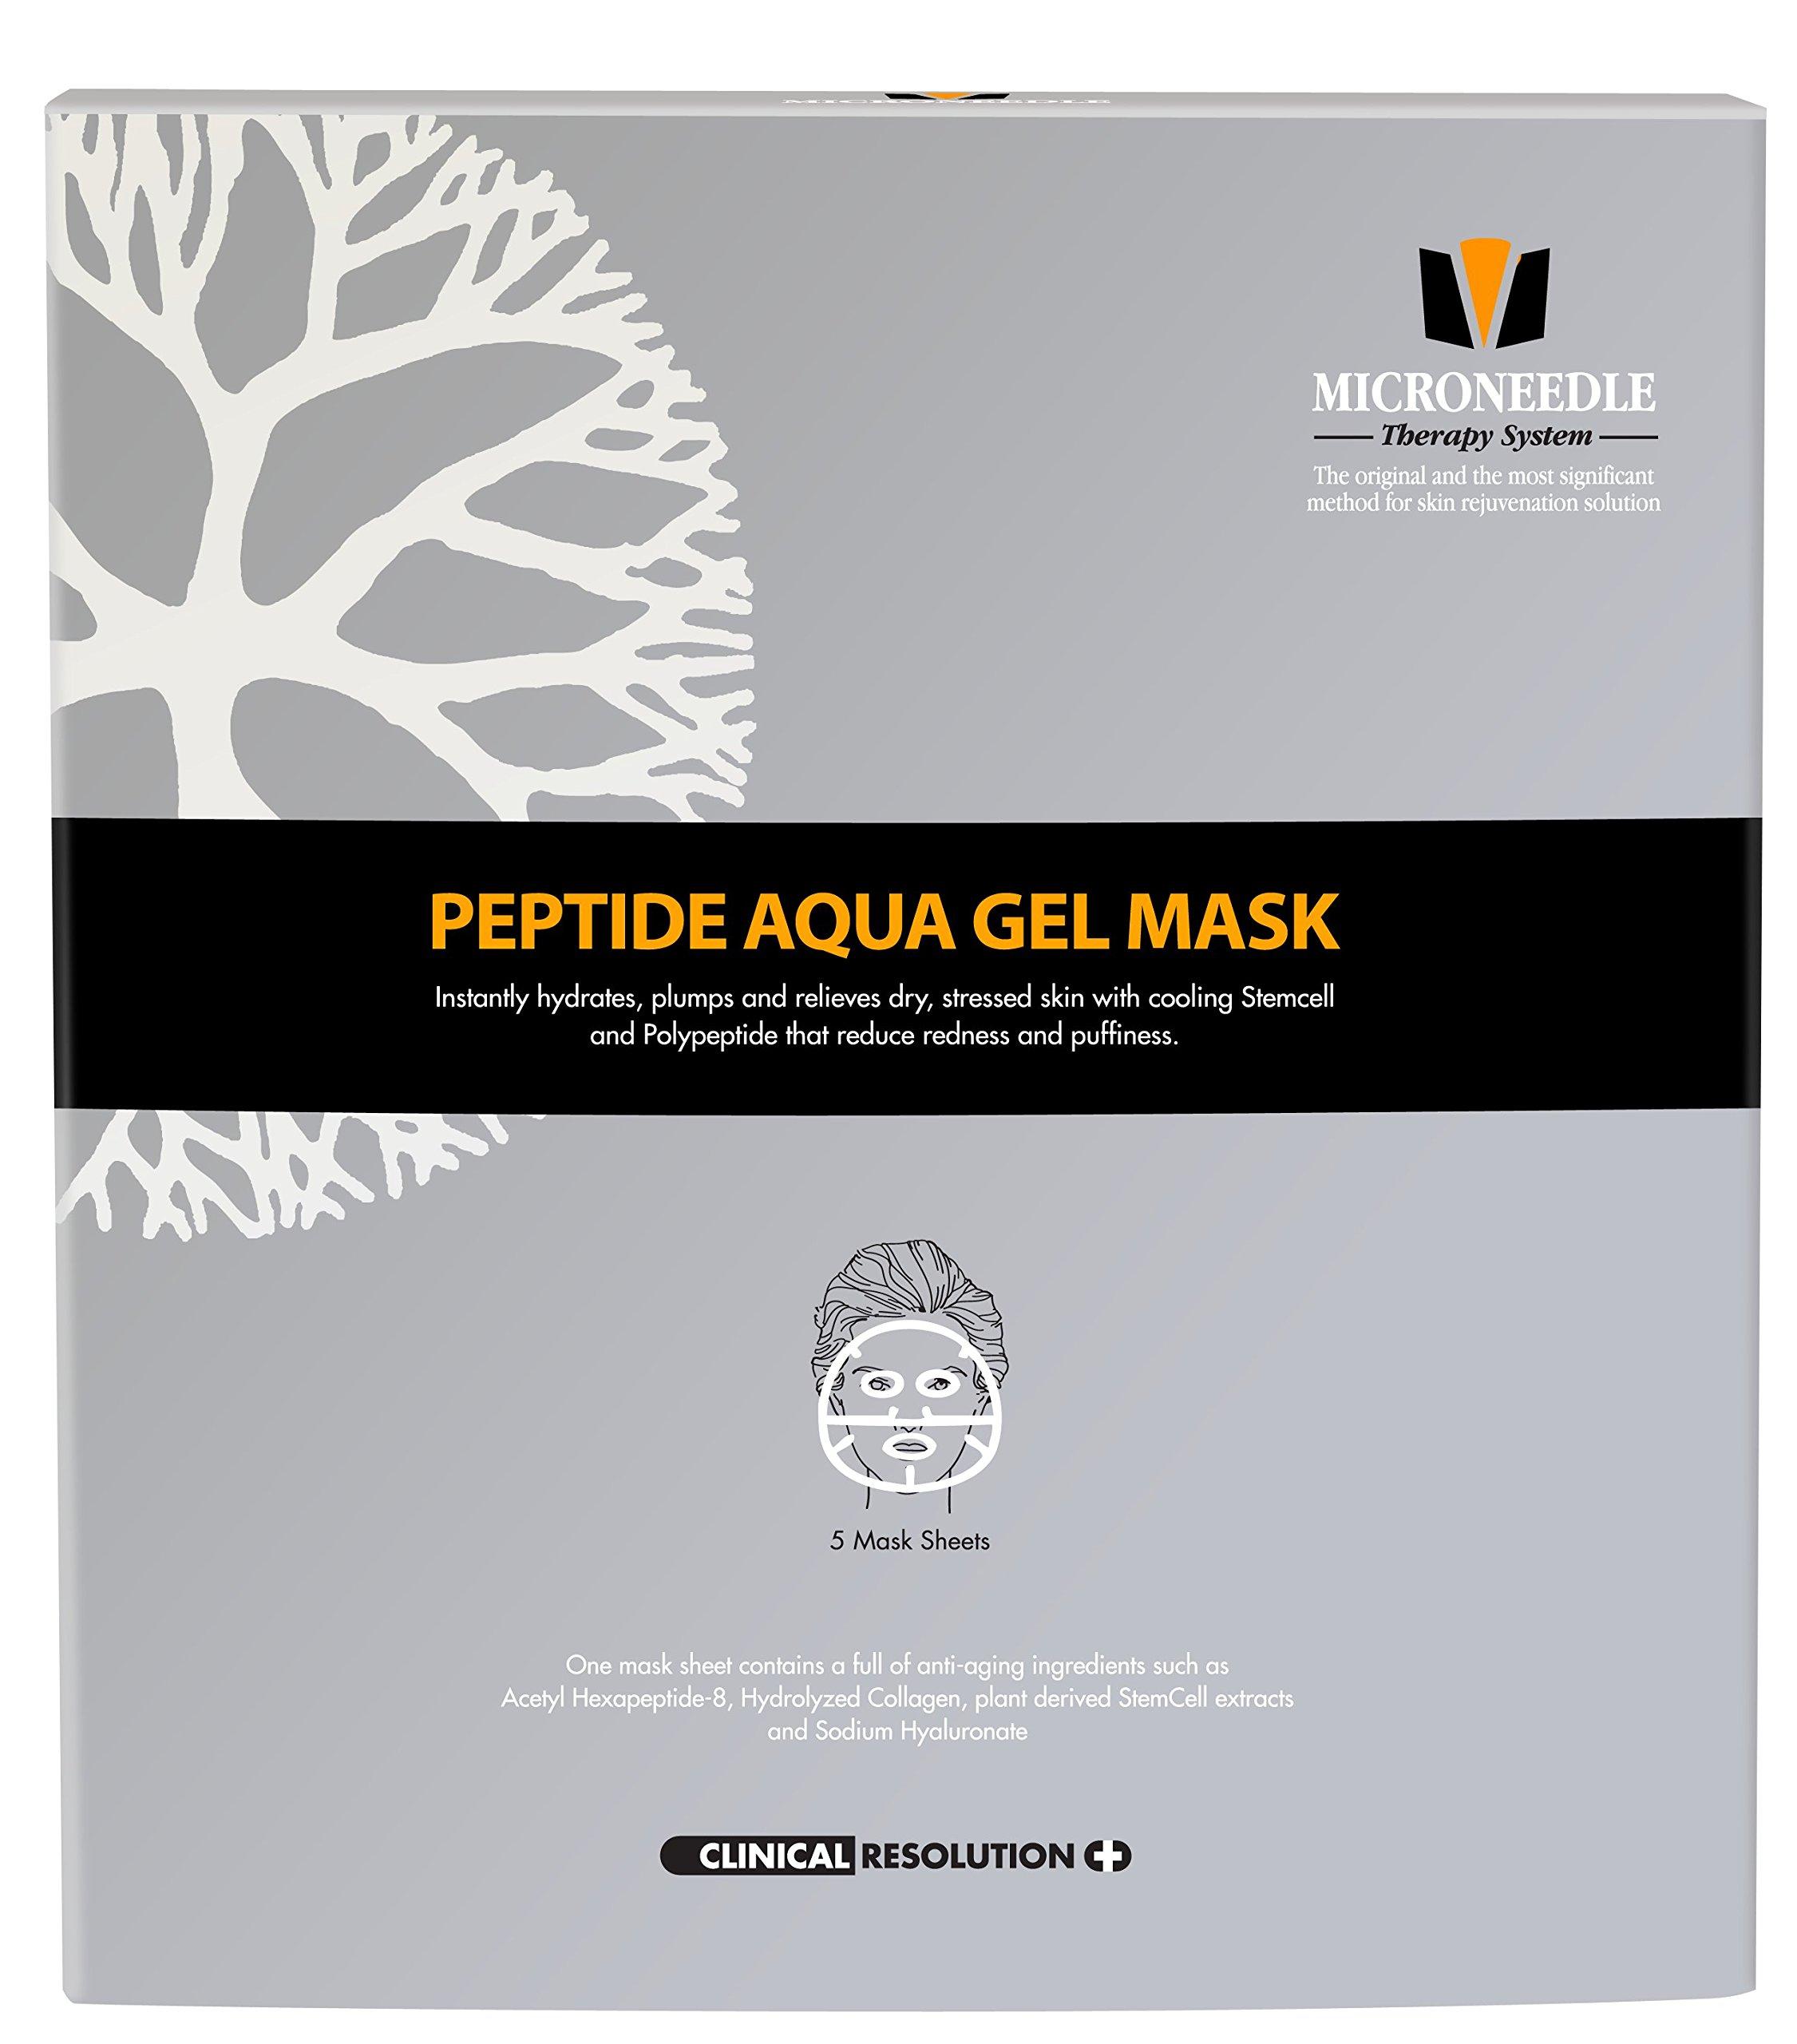 MTS Peptide Aqua Gel Mask 5 Pcs / Box, Hydrating, Soothing, Cooling, Healing, Post-treatment, Post-rolling, Reduce Redness and Stinging Feeling